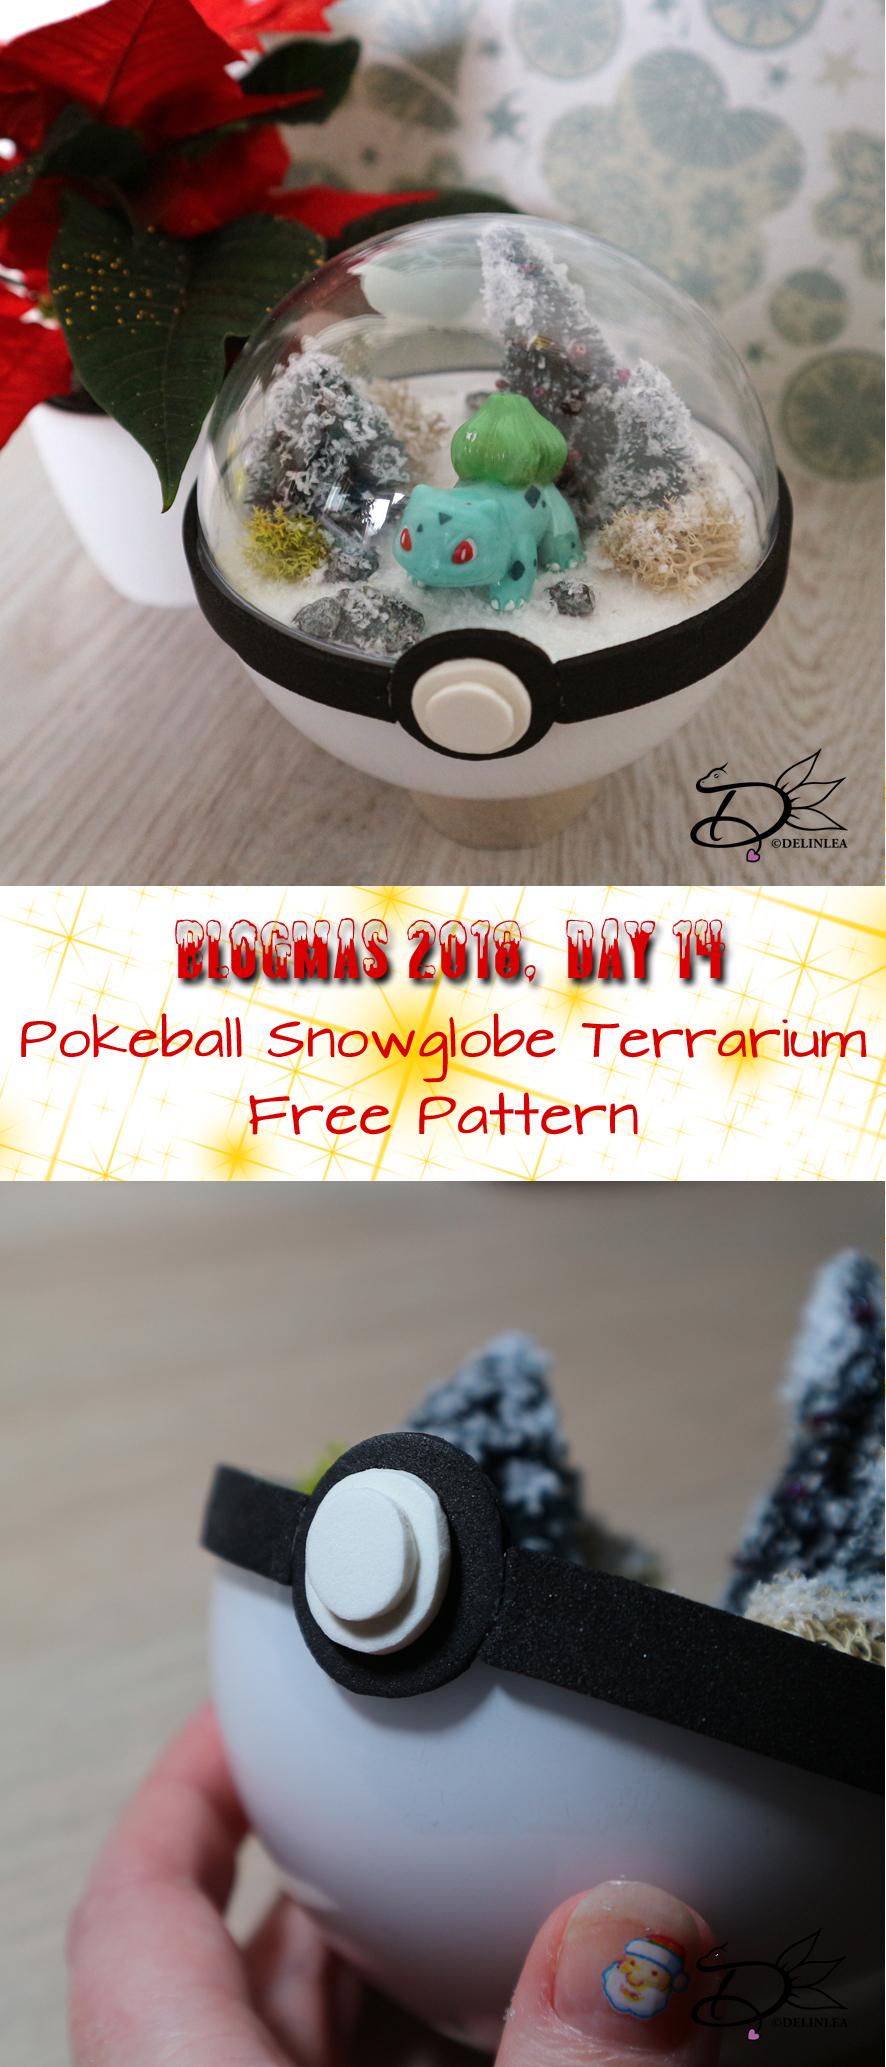 Day 14 Pokeball Snowglobe Terrarium Delinlea My Little Fantasy World